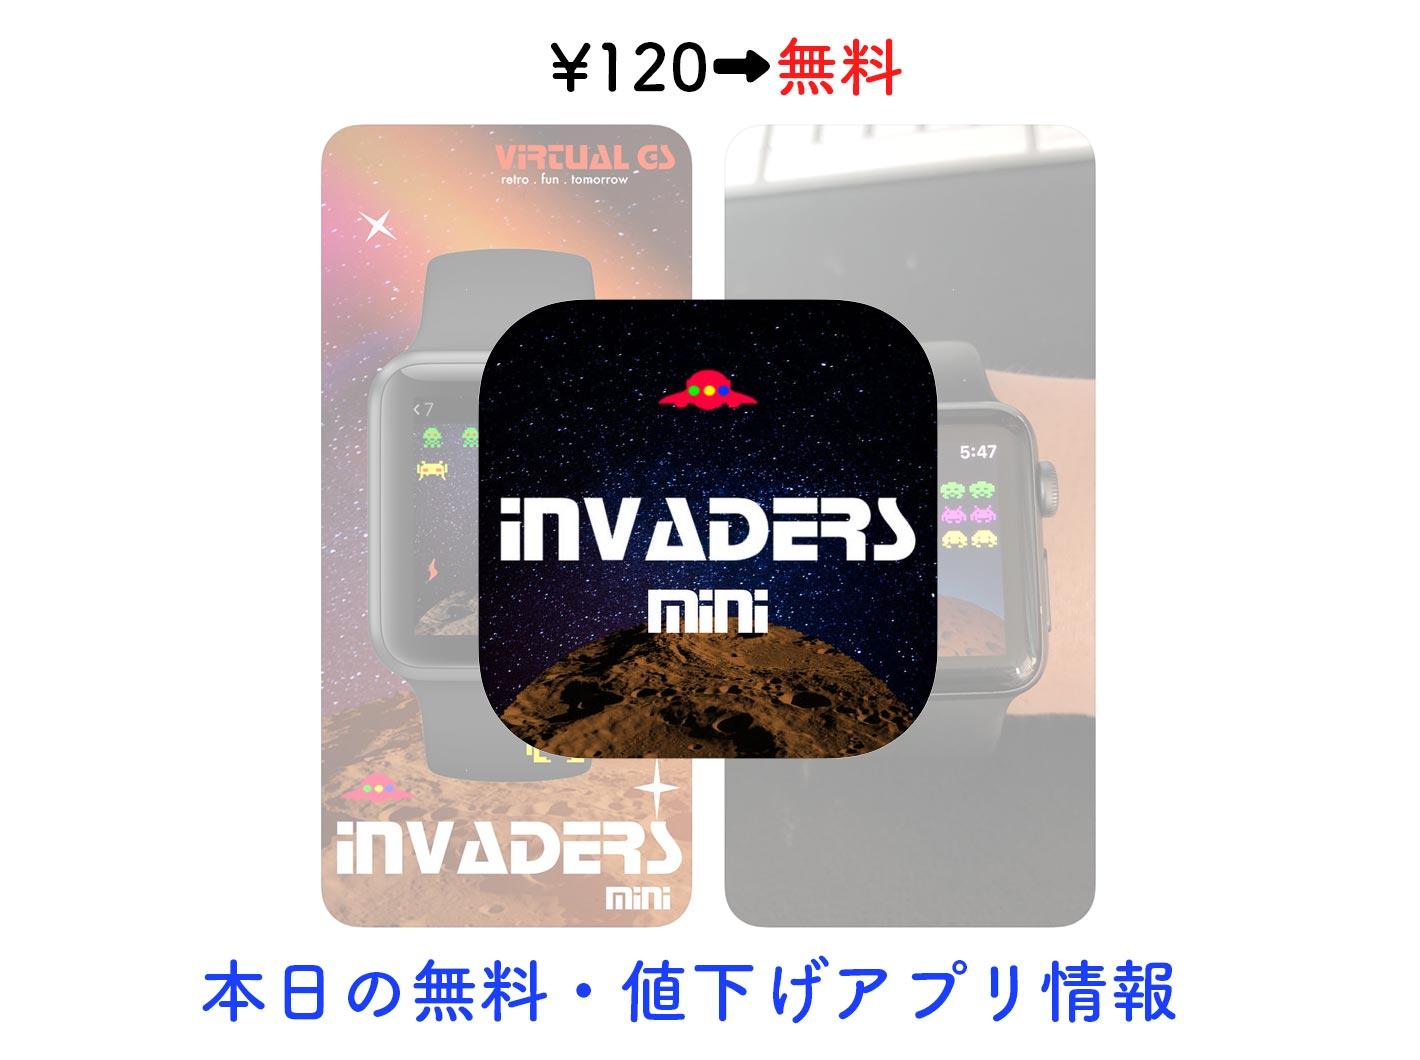 Appsale0818